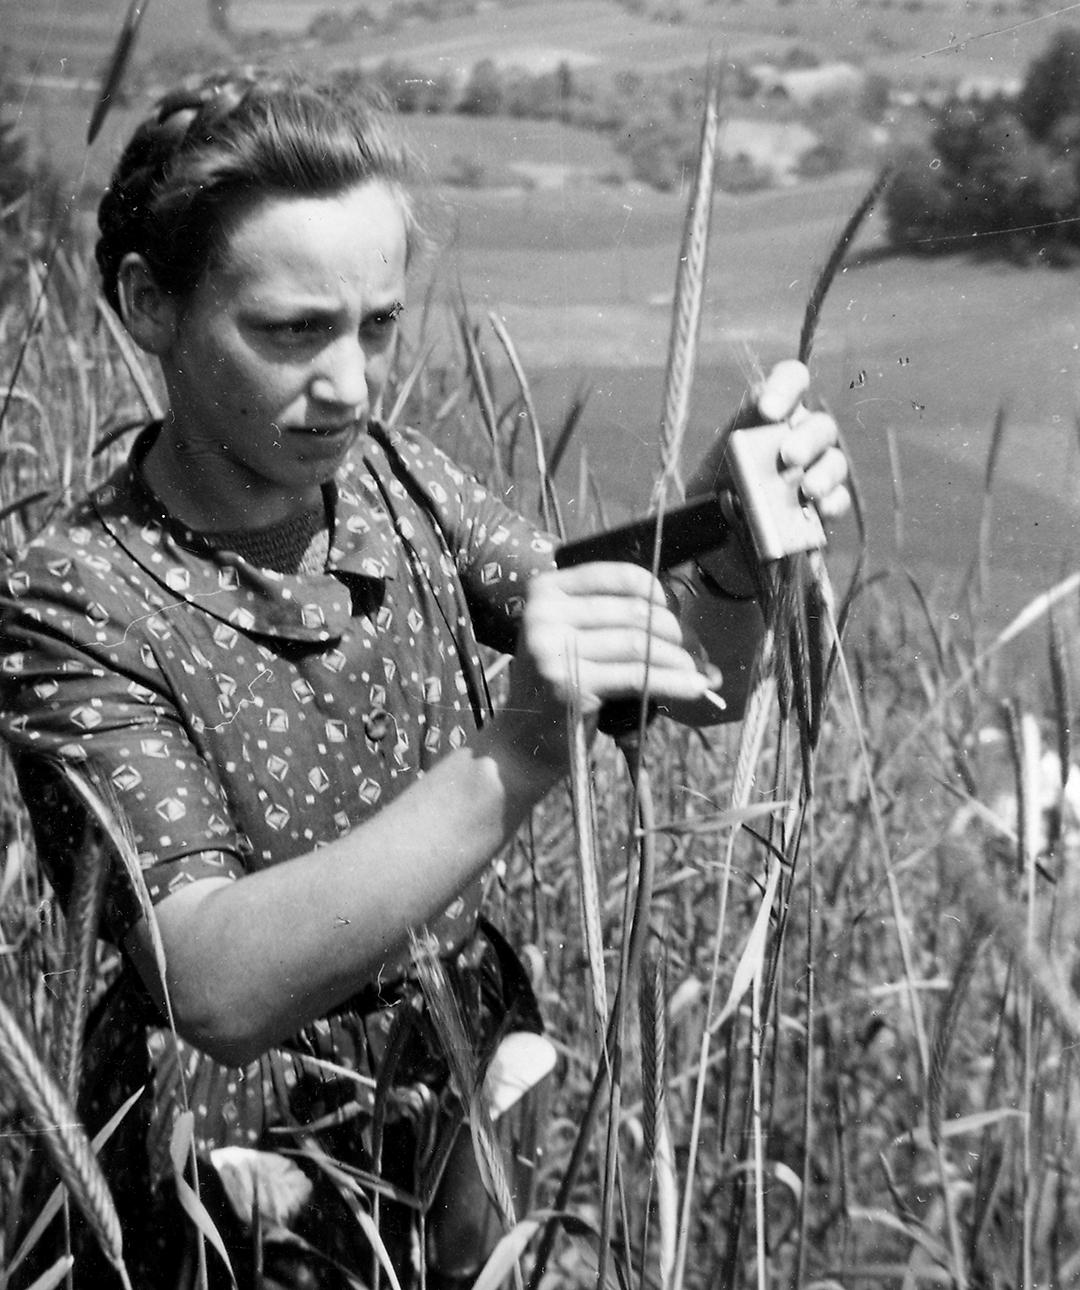 Pistolenimpfung der Roggenähre mit Mutterkorn, 1943. © Novartis Firmenarchiv